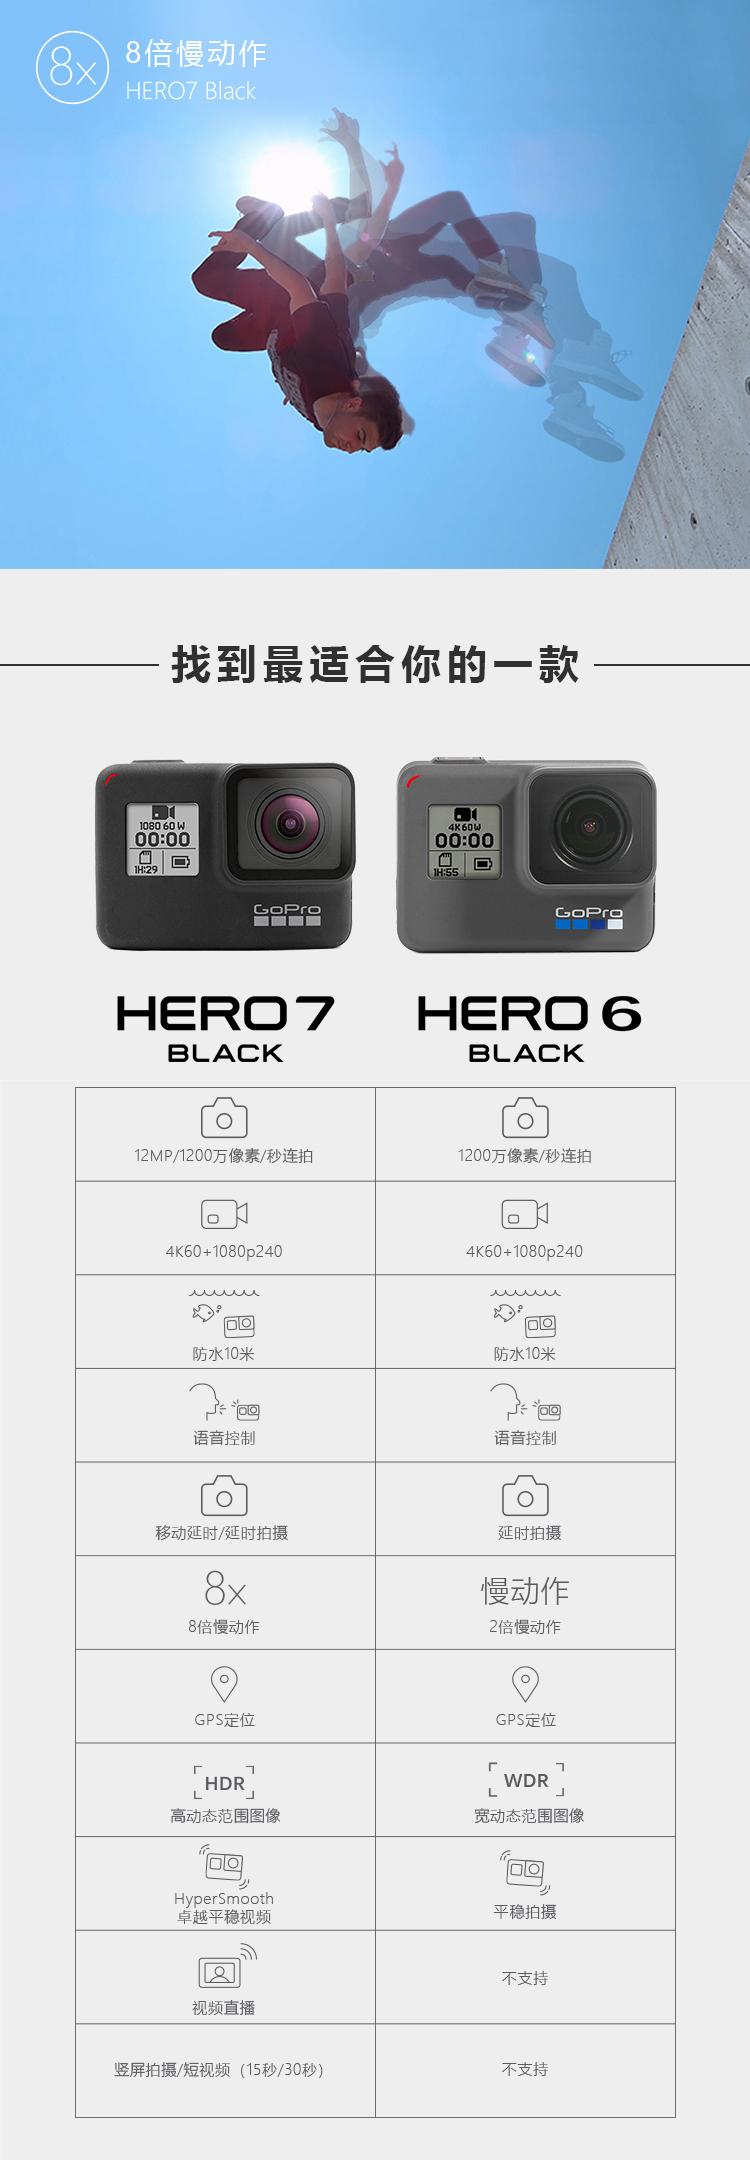 GoPro HERO7 BLACK运动相机4K高清语音防抖防水潜水摄像机狗6/5